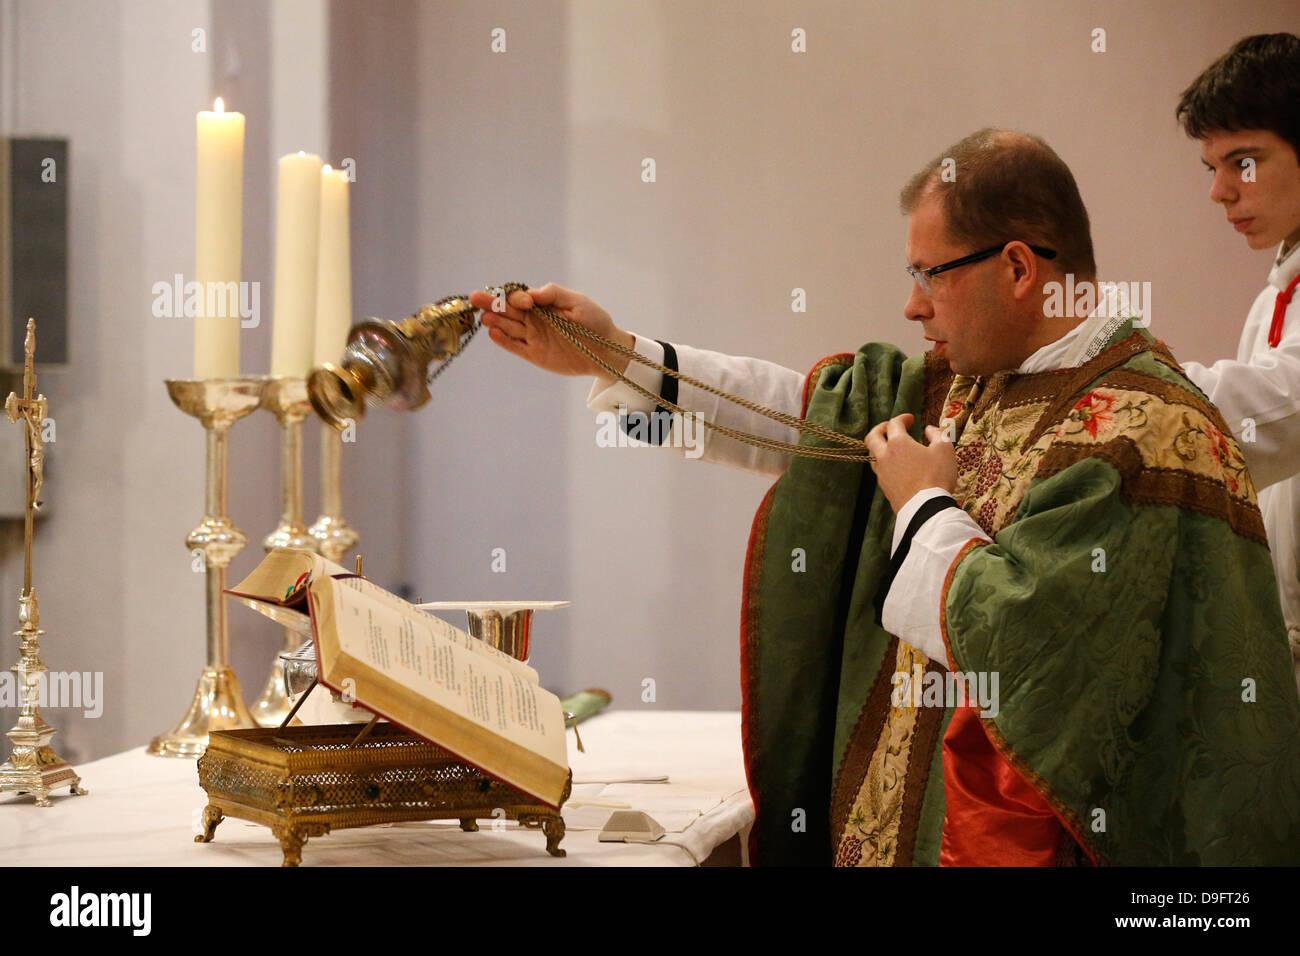 Incense during Mass, St. Louis church, Villemomble, Seine-St. Denis, France - Stock Image